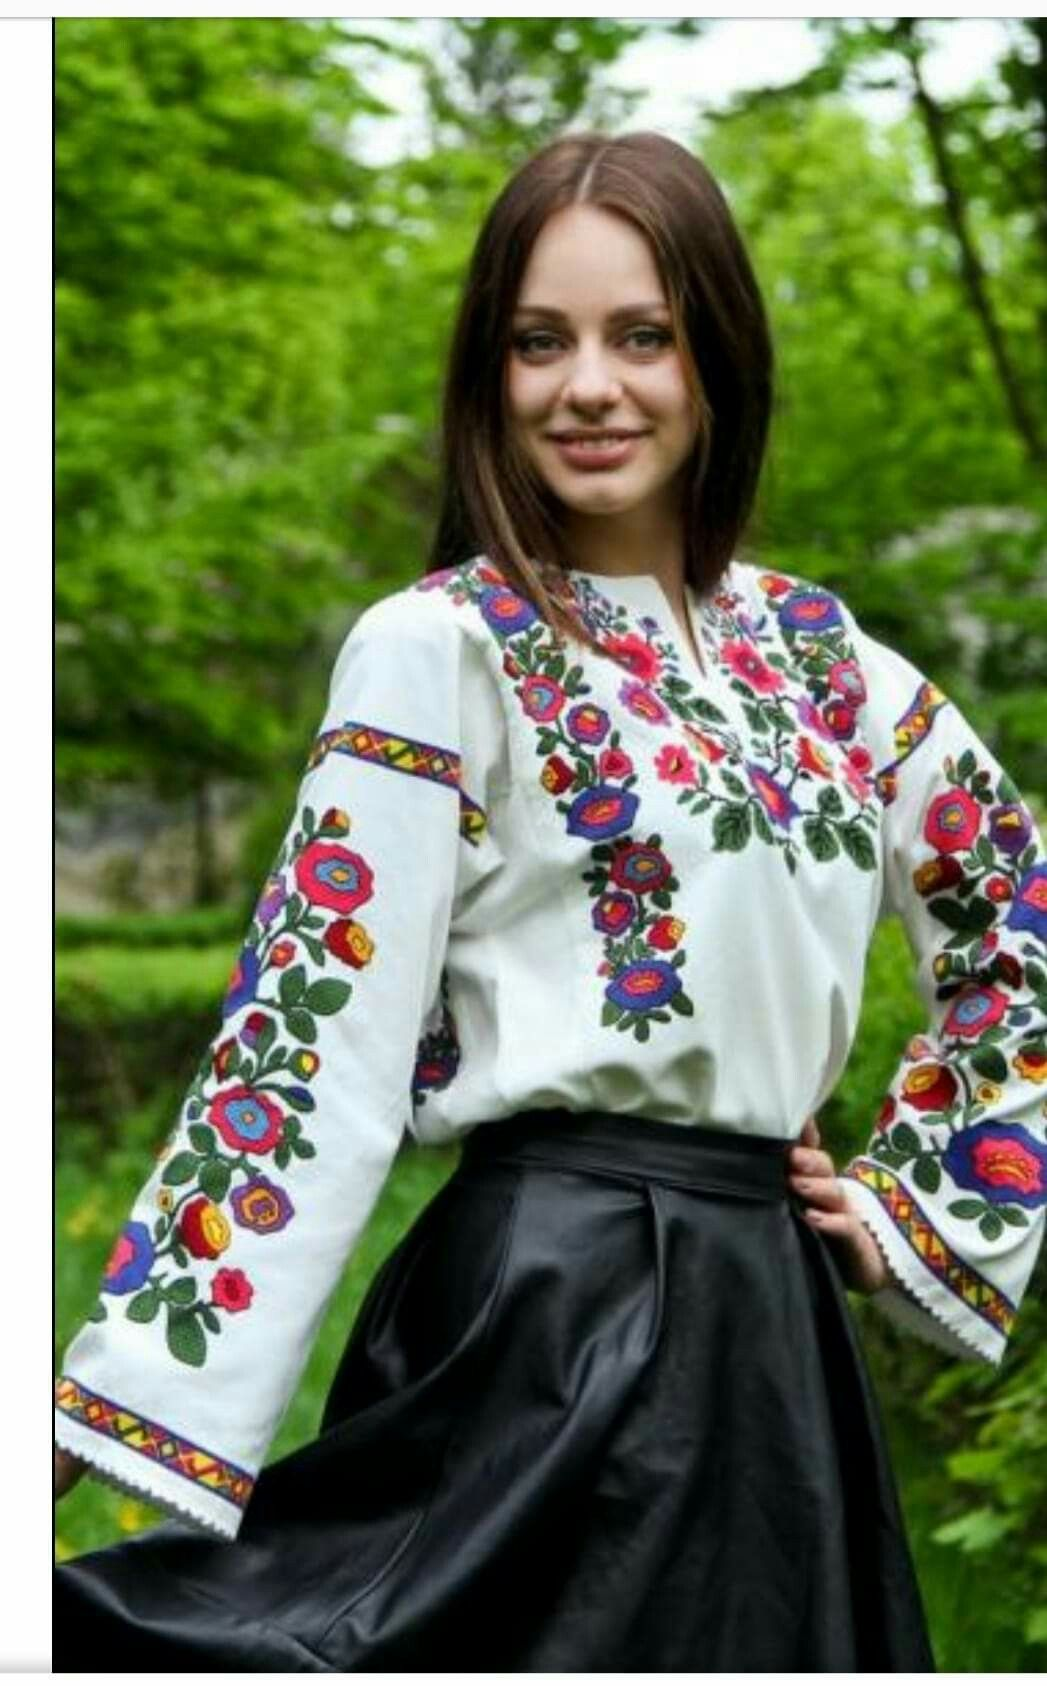 89ec5b9fa3d736 Pin by Tanya Melnychuk on вишитий одяг | Сукні, Одяг, Ручна вишивка